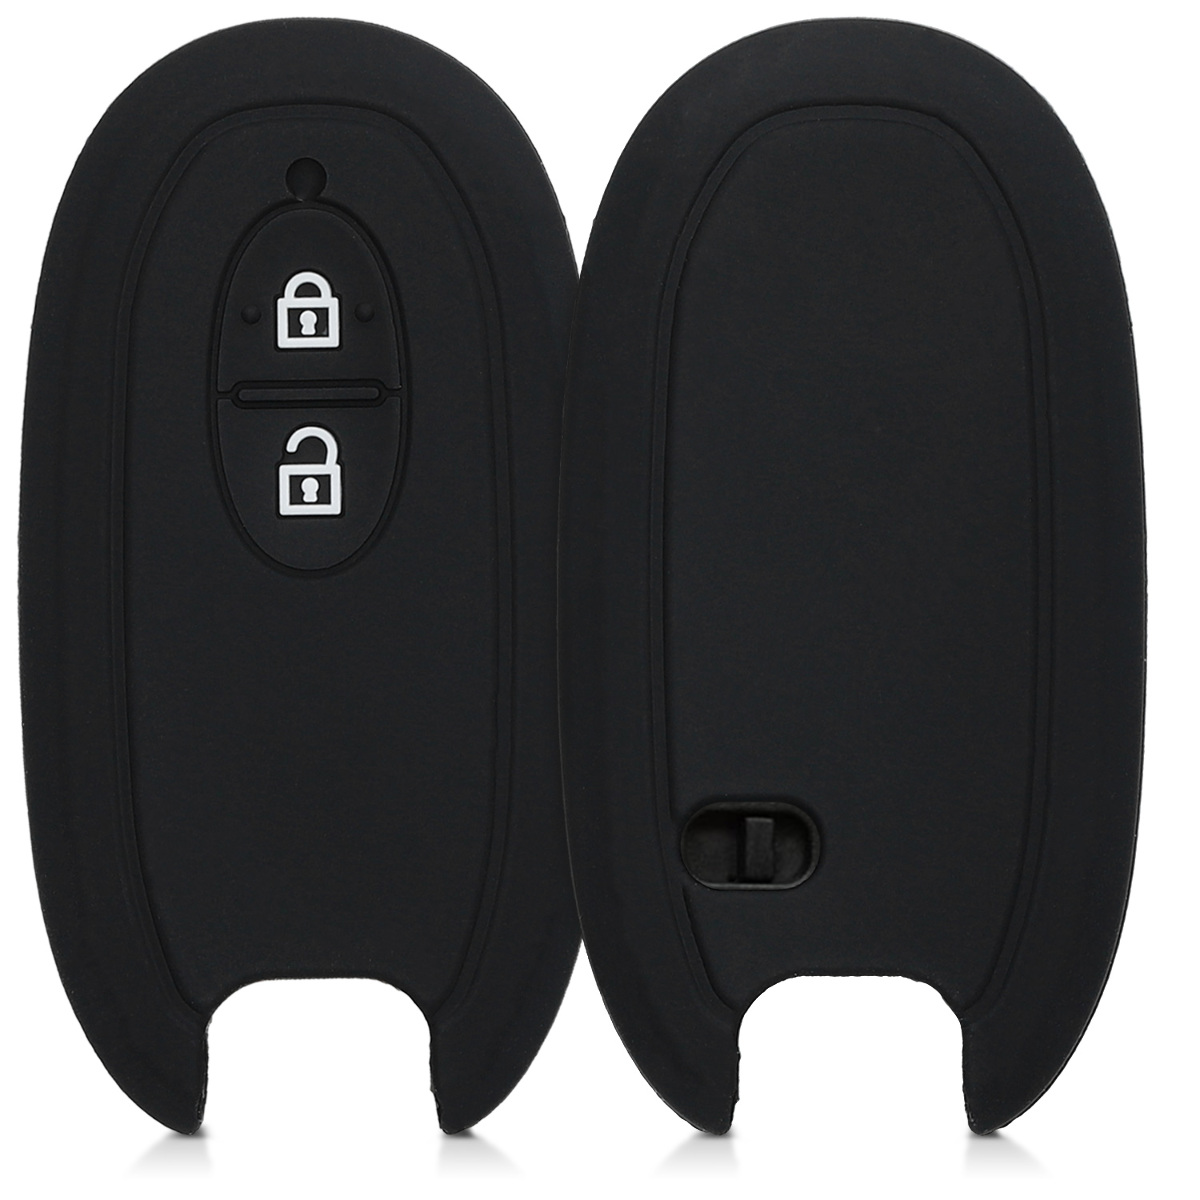 KW Θήκη Κλειδιού Suzuki - Σιλικόνη - 2 Κουμπιά - Black (47670.01)